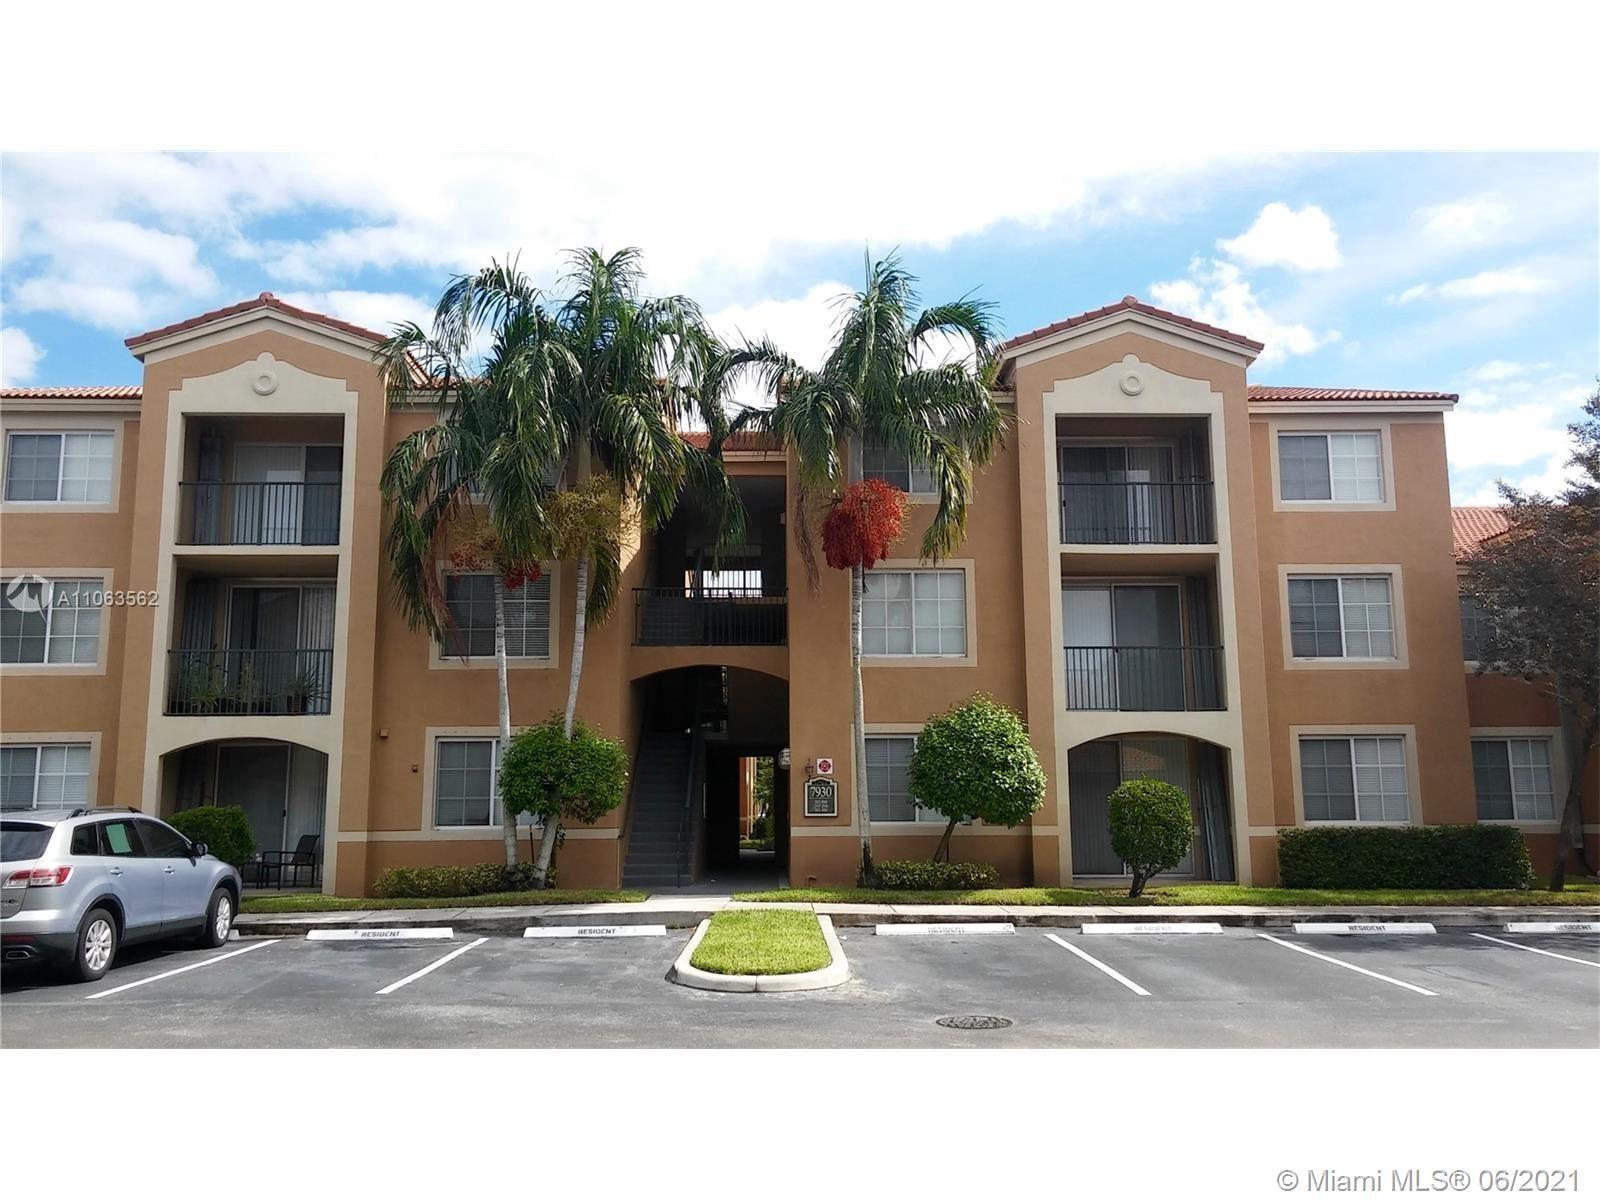 7930 N Nob Hill Rd #206, Tamarac, FL 33321 - #: A11063562